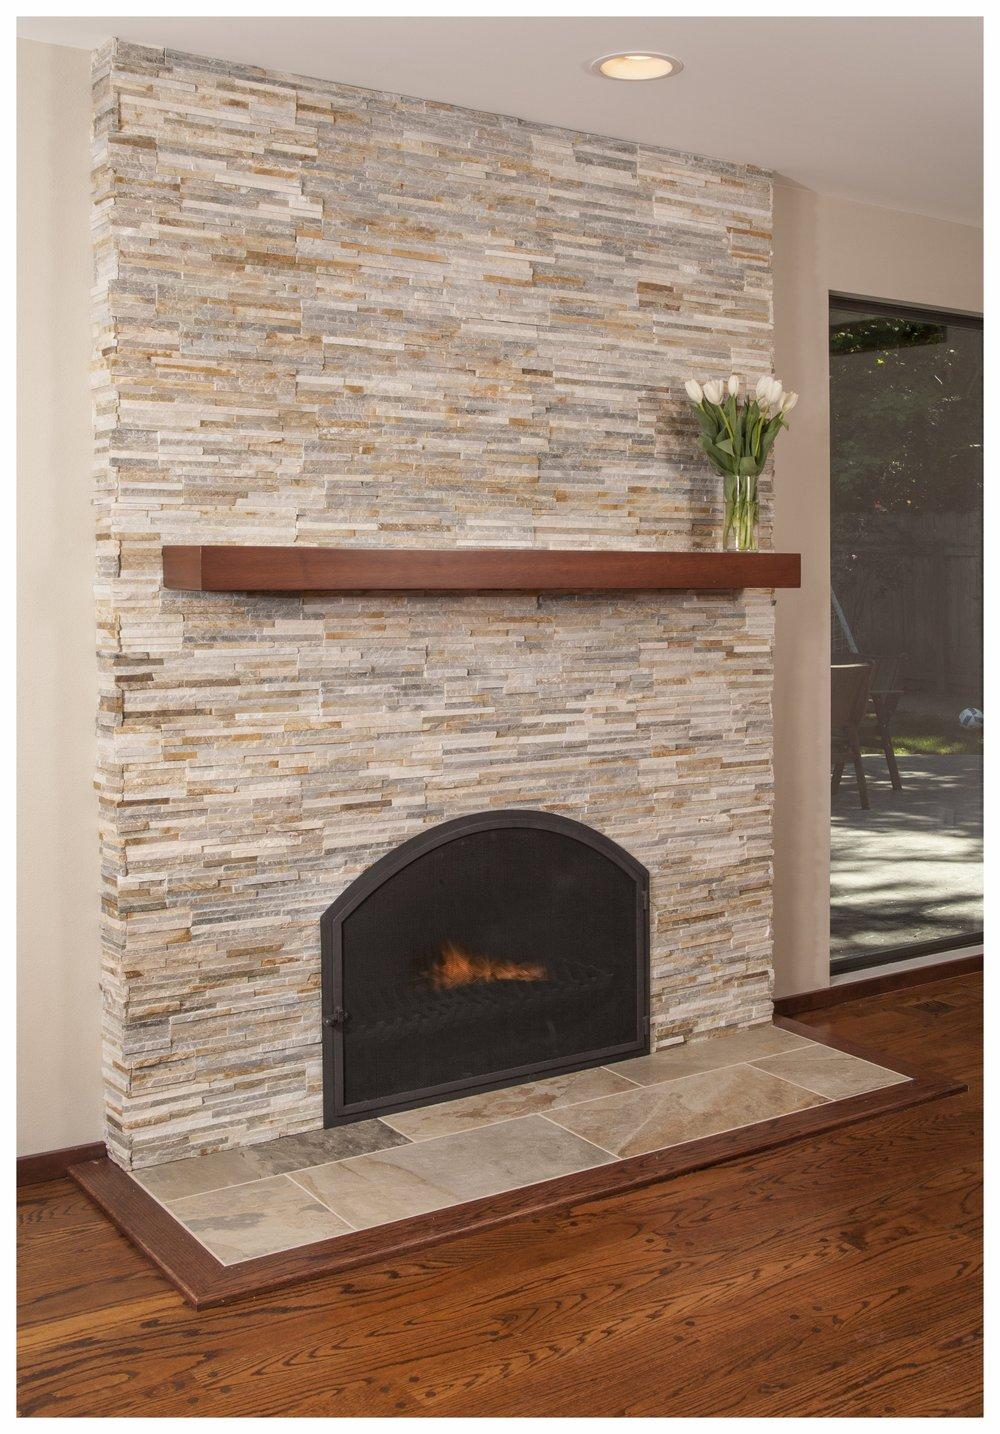 Fireplace 10.jpg